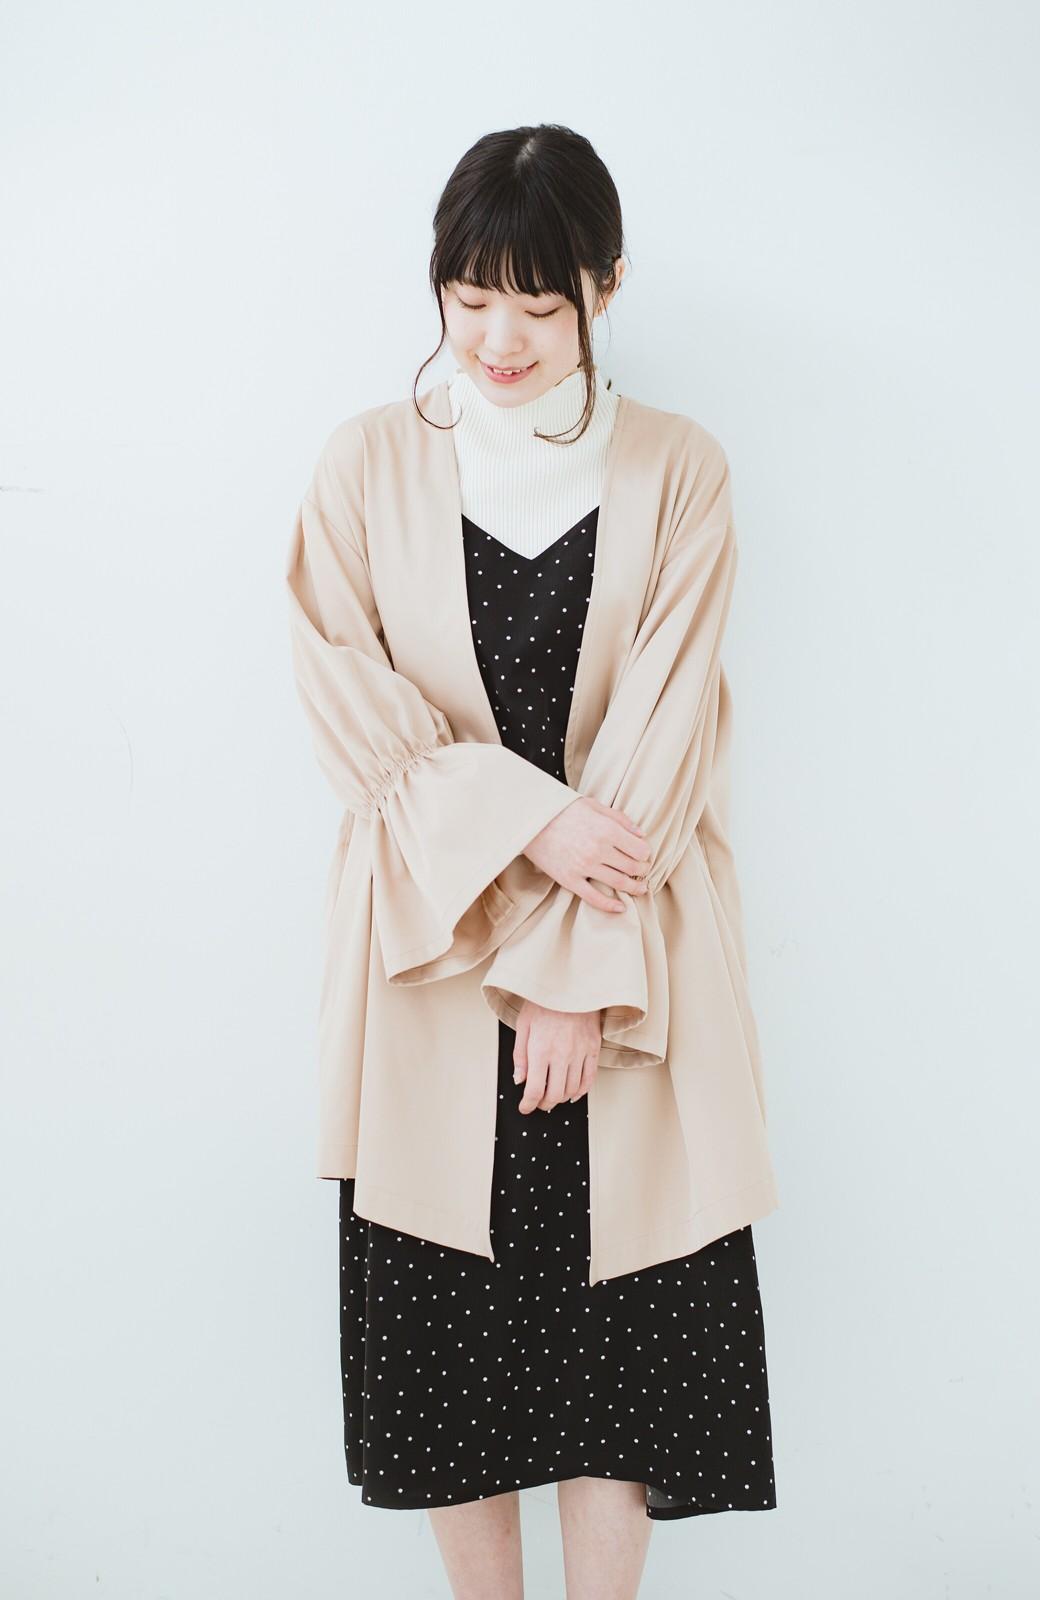 haco! ただ羽織るだけでオシャレに見える 気軽なフレアースリーブコート <ベージュ>の商品写真9